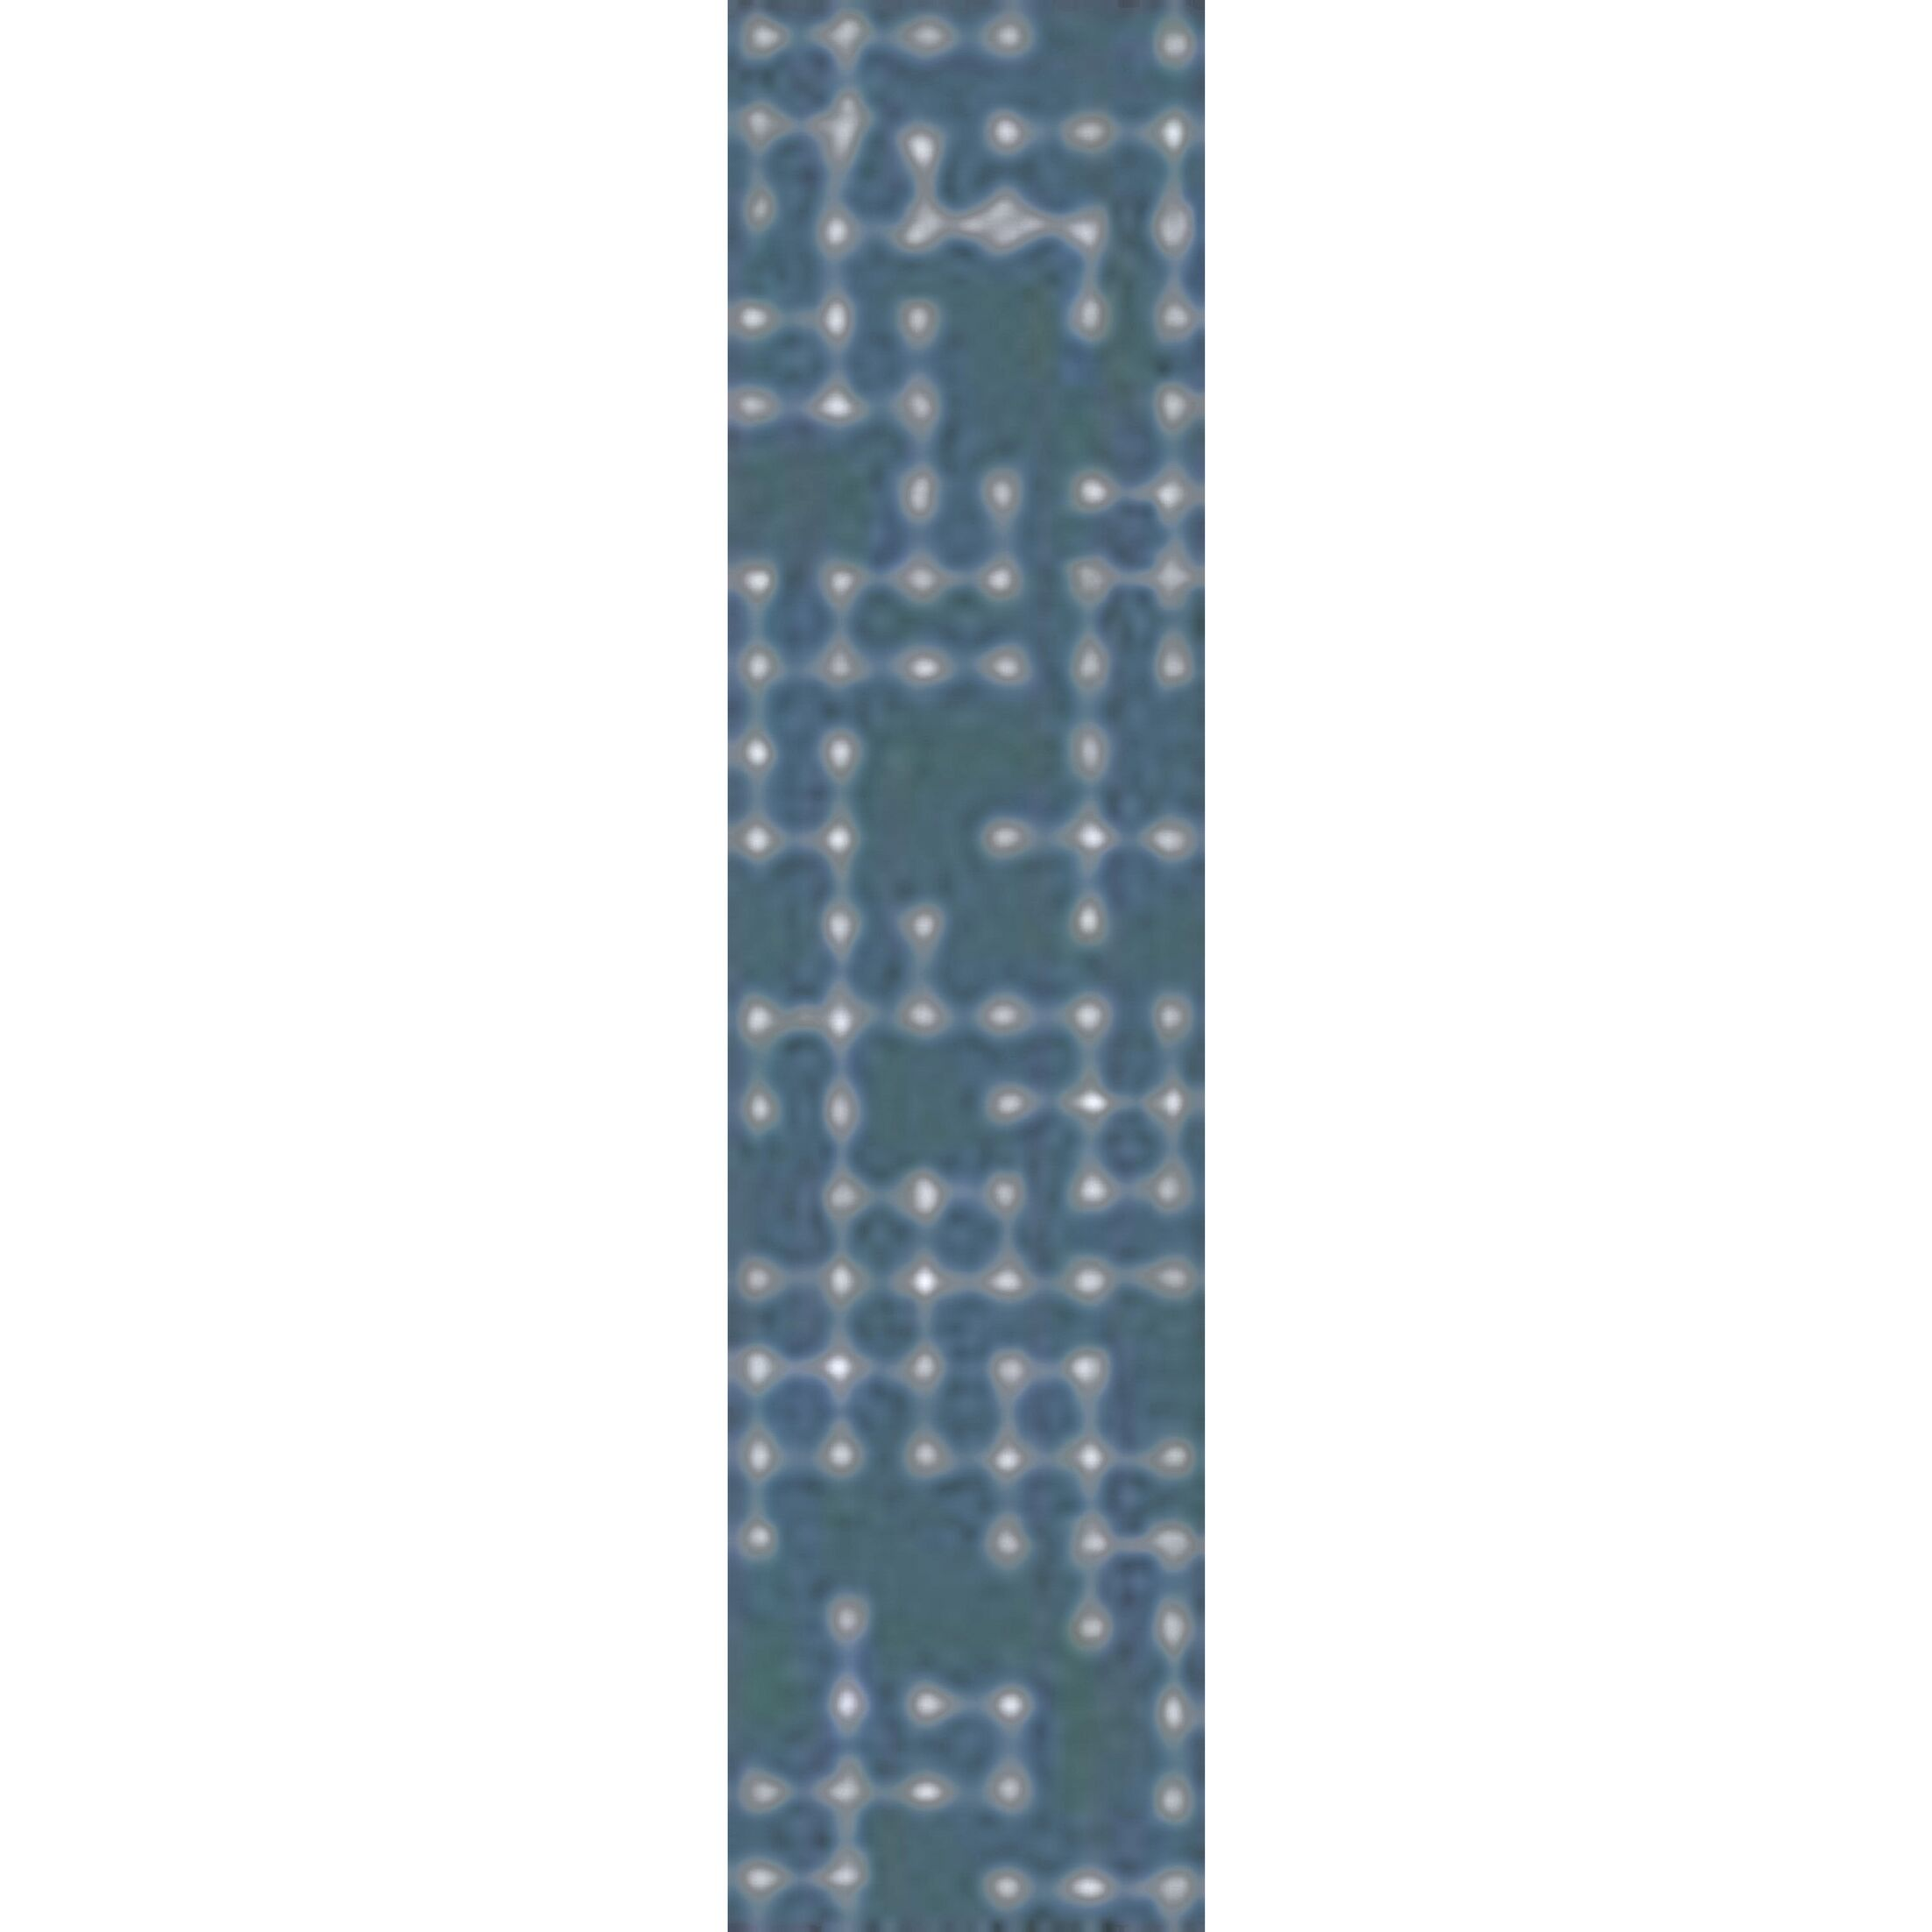 Serpentis Hand-Hooked Bright Blue/Sage Area Rug Rug Size: Runner 2'6